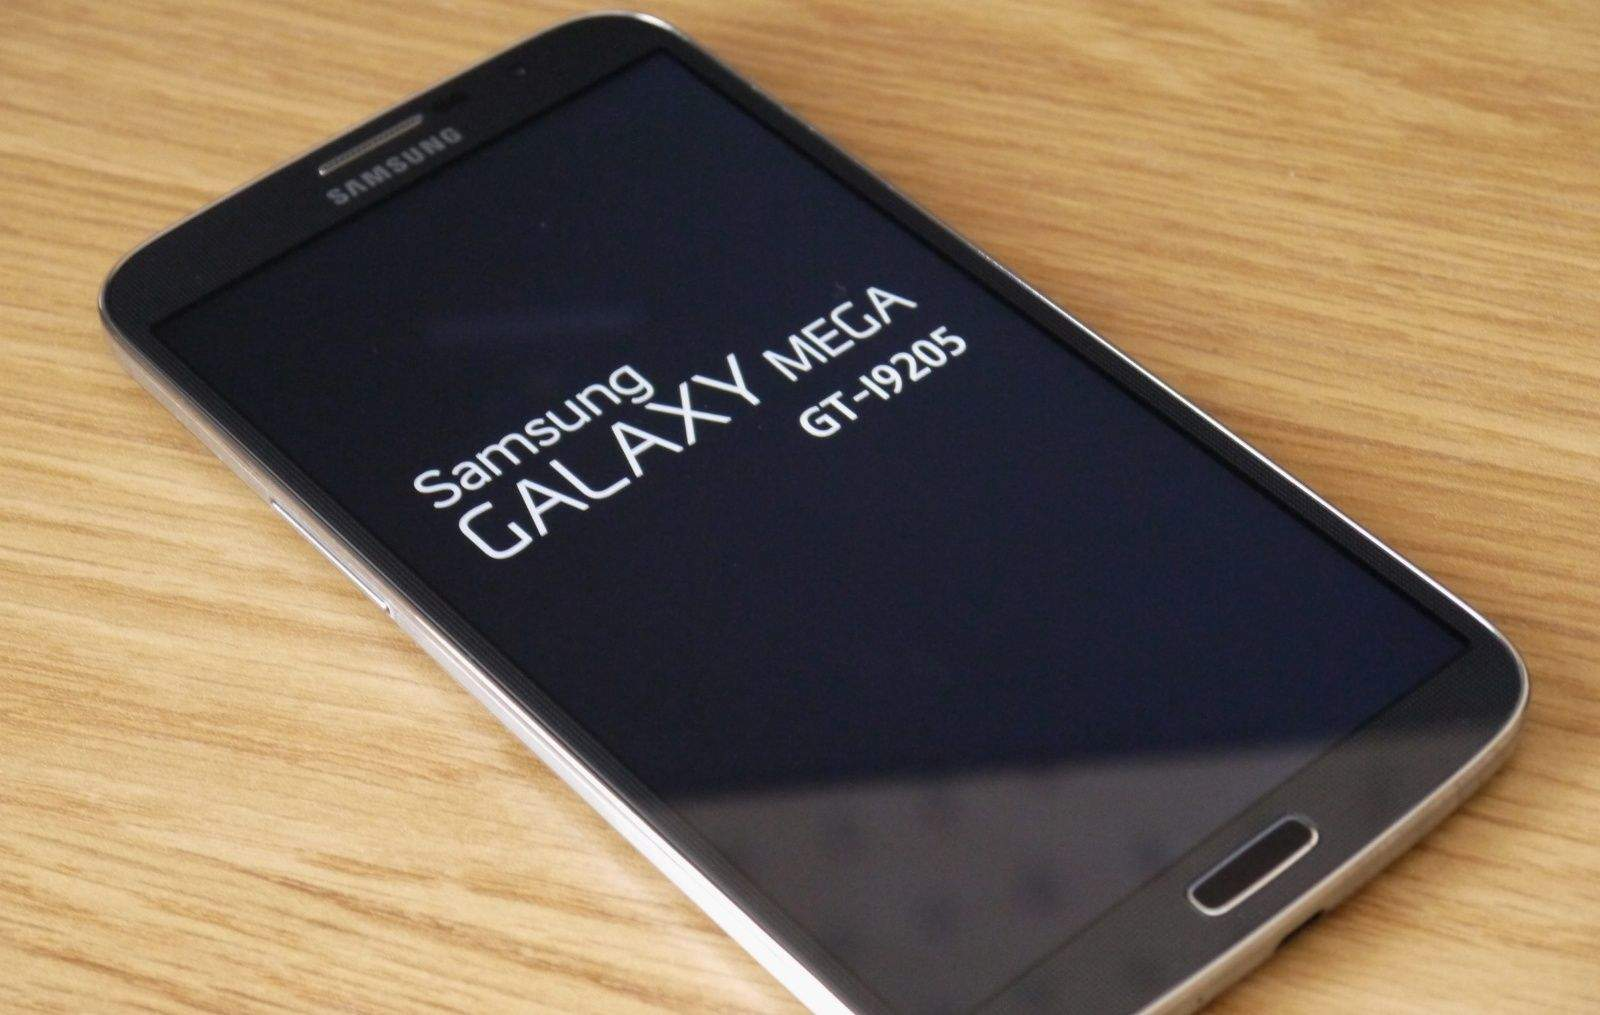 samsung galaxy s5 manual update